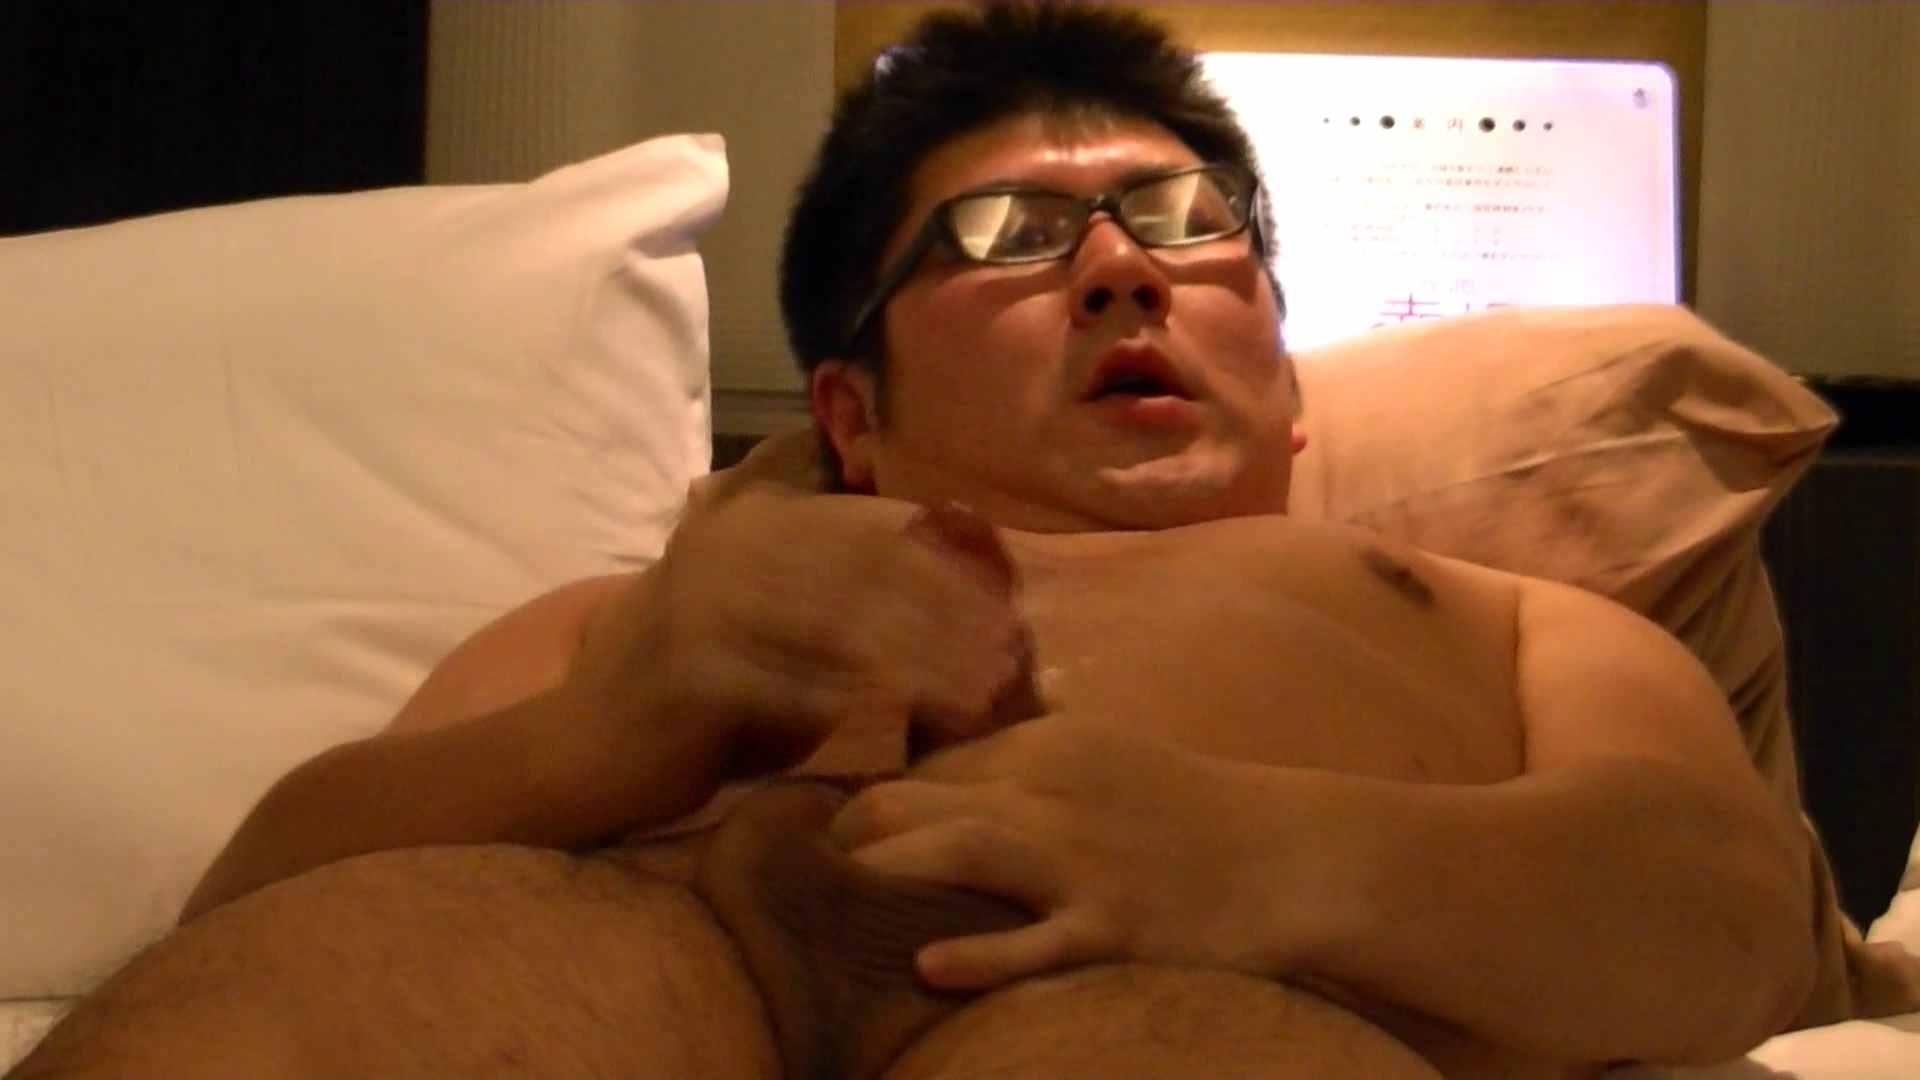 Mr.オナックスさん投稿!HD 貴方のオナニー三万円で撮影させてください。VOL.03 後編 完全無修正でお届け | オナニー特集  83pic 10